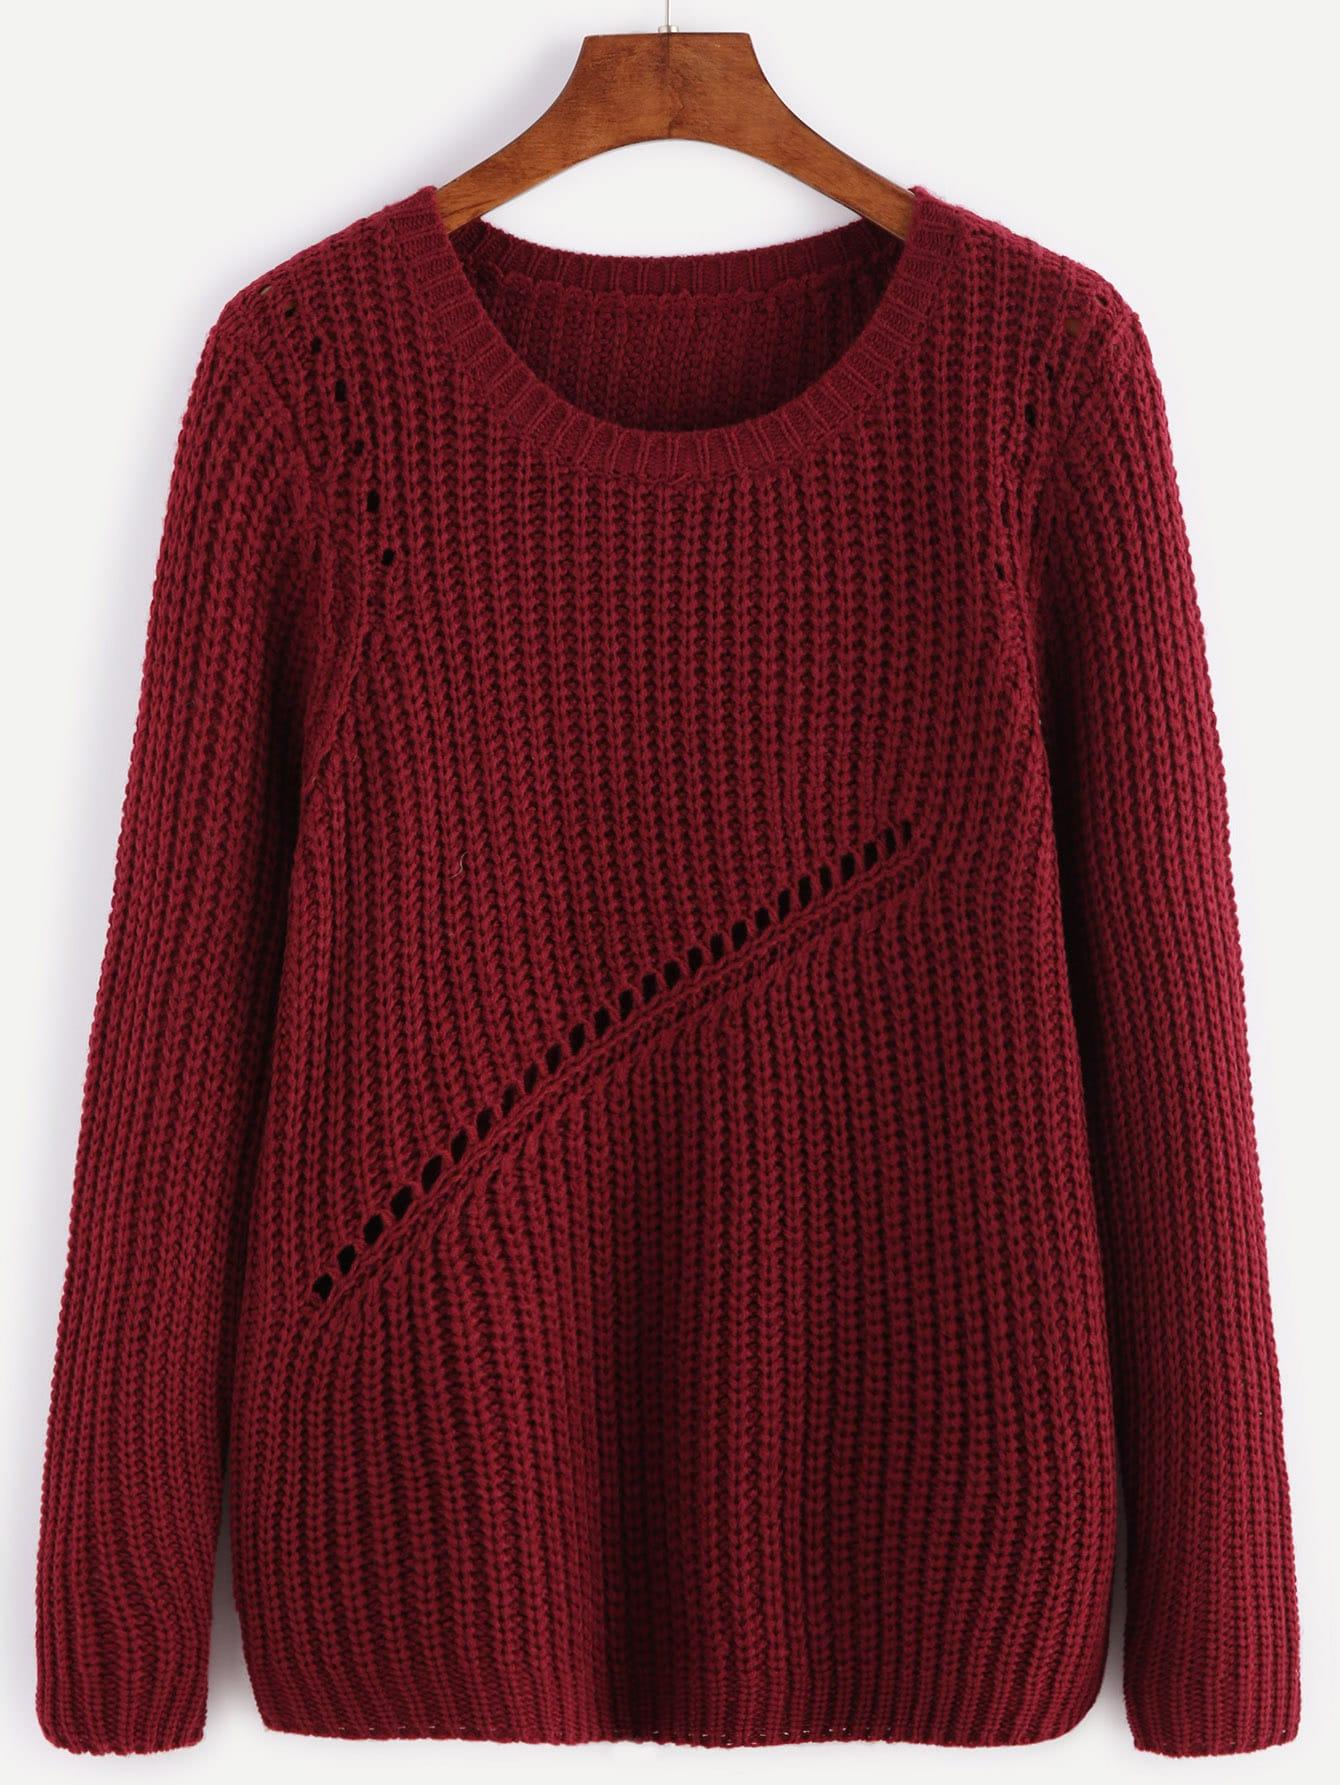 Burgundy Ribbed Knit Eyelet Panel SweaterBurgundy Ribbed Knit Eyelet Panel Sweater<br><br>color: Burgundy<br>size: one-size